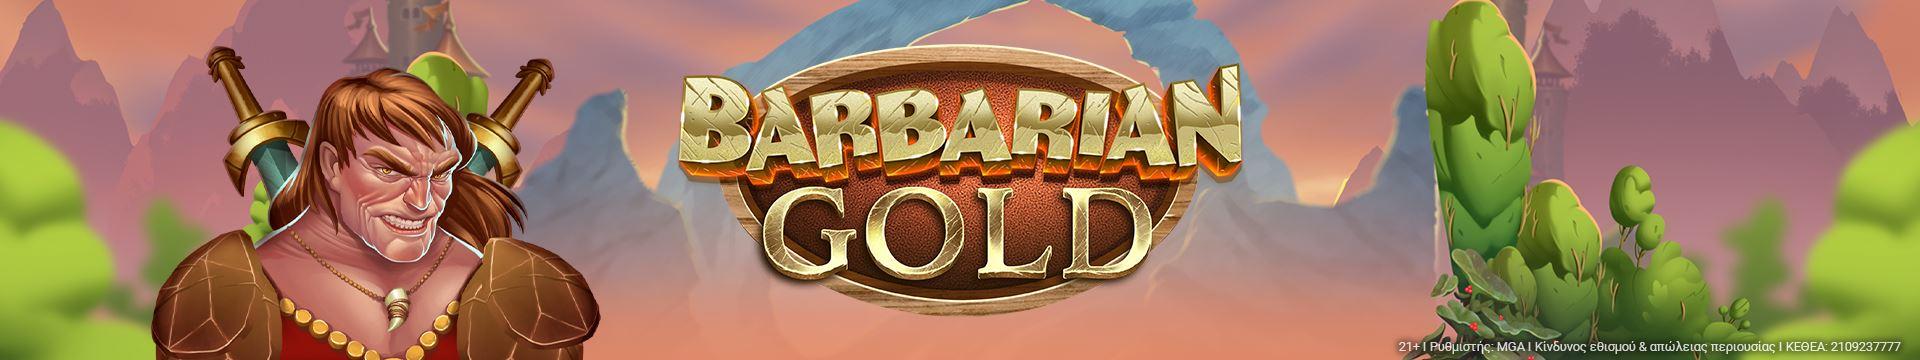 Barbarian_Gold